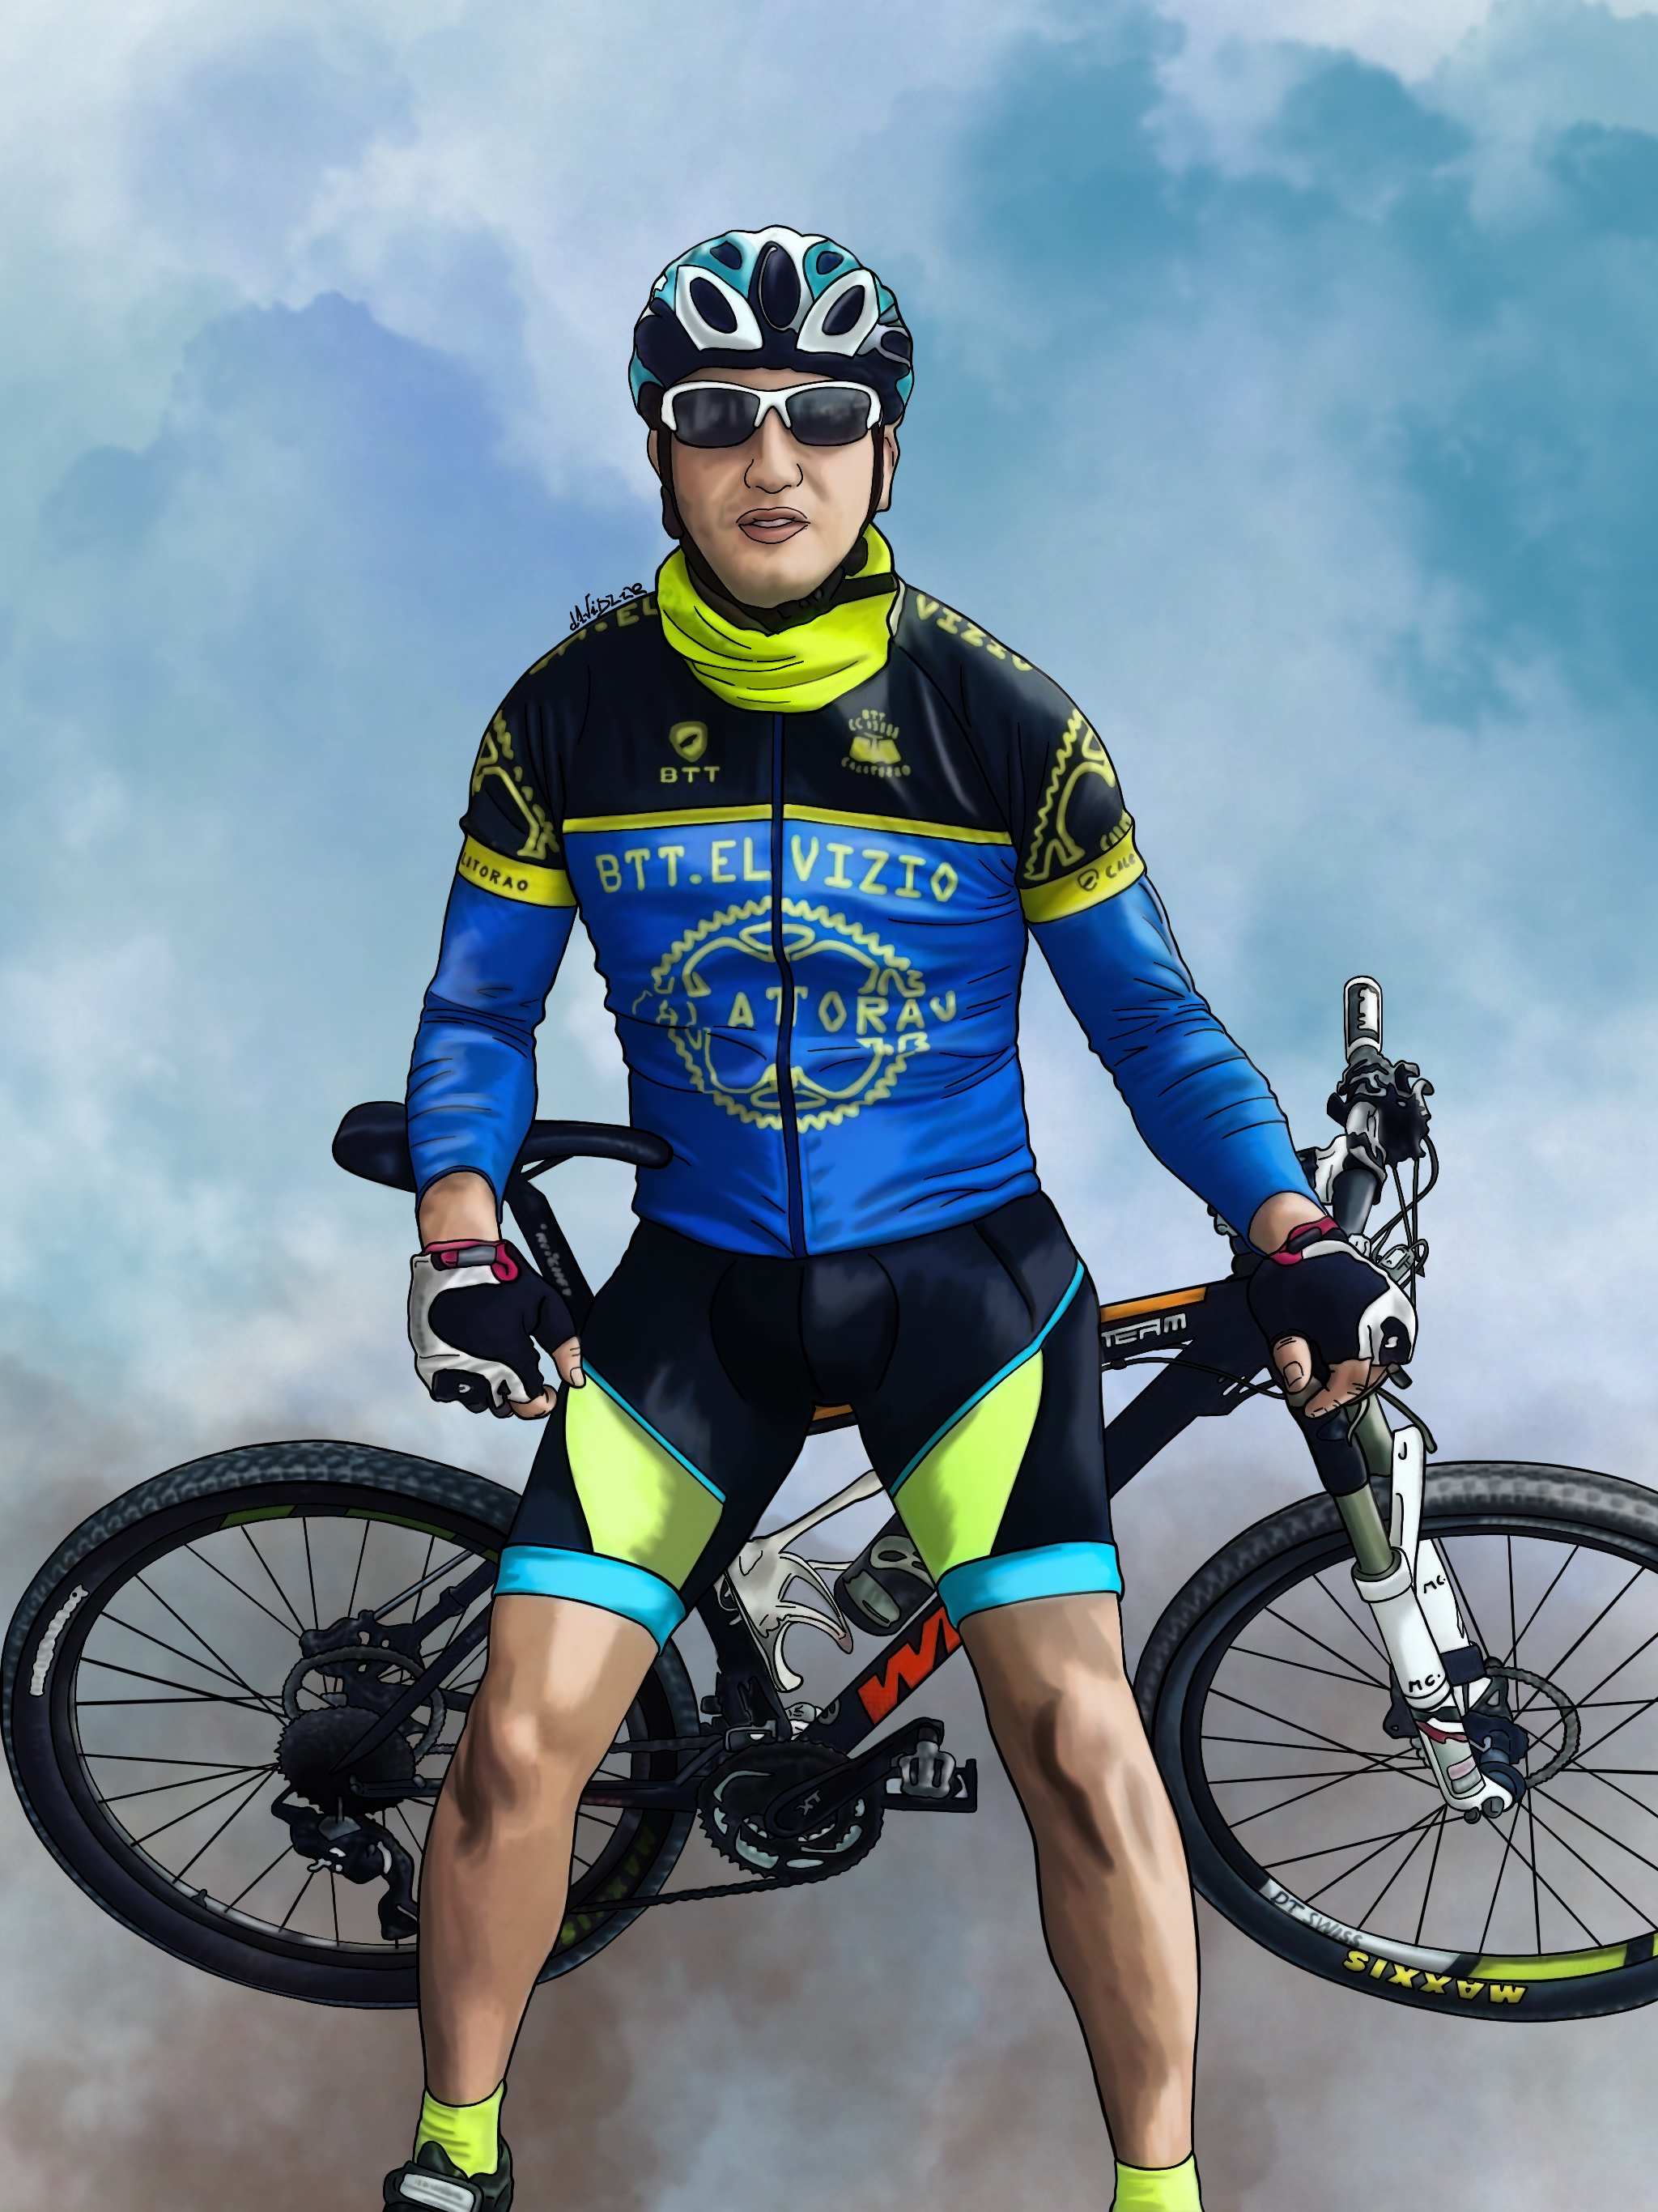 Retratos__David_Pallás_Gozalo_ciclista